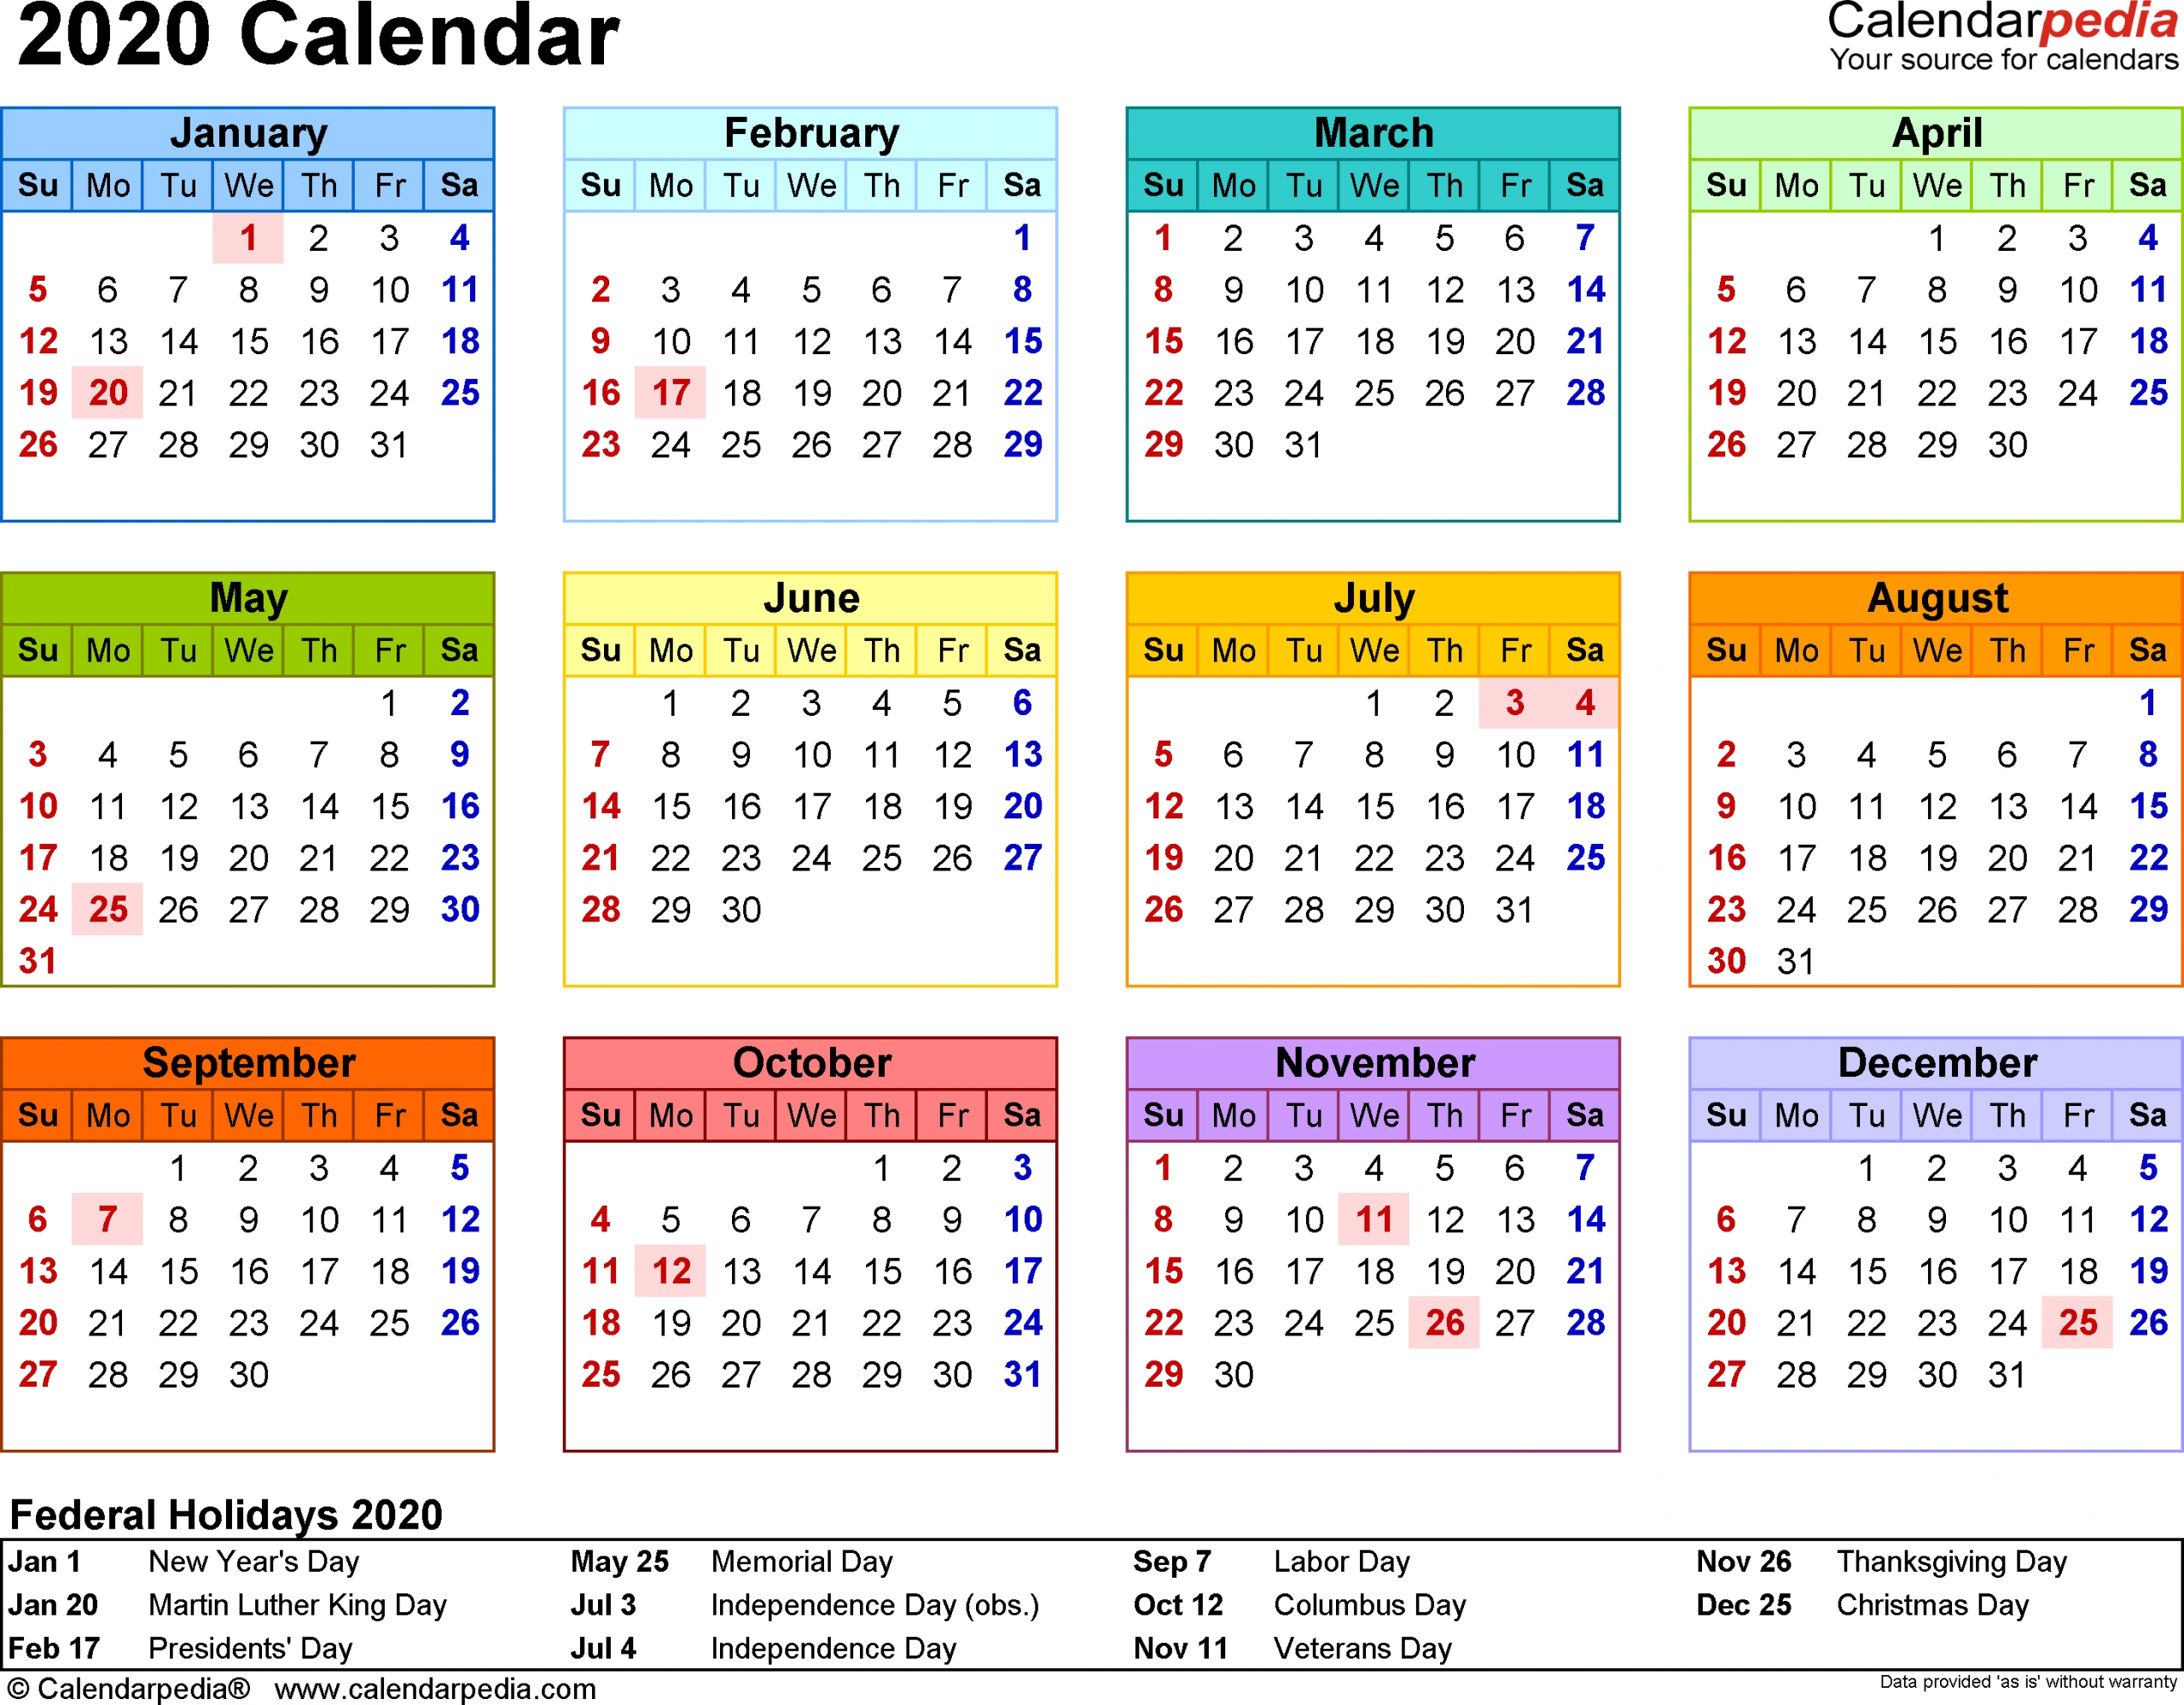 Excel 2021 Calendar Drop Down | Printable Calendar 2020-2021